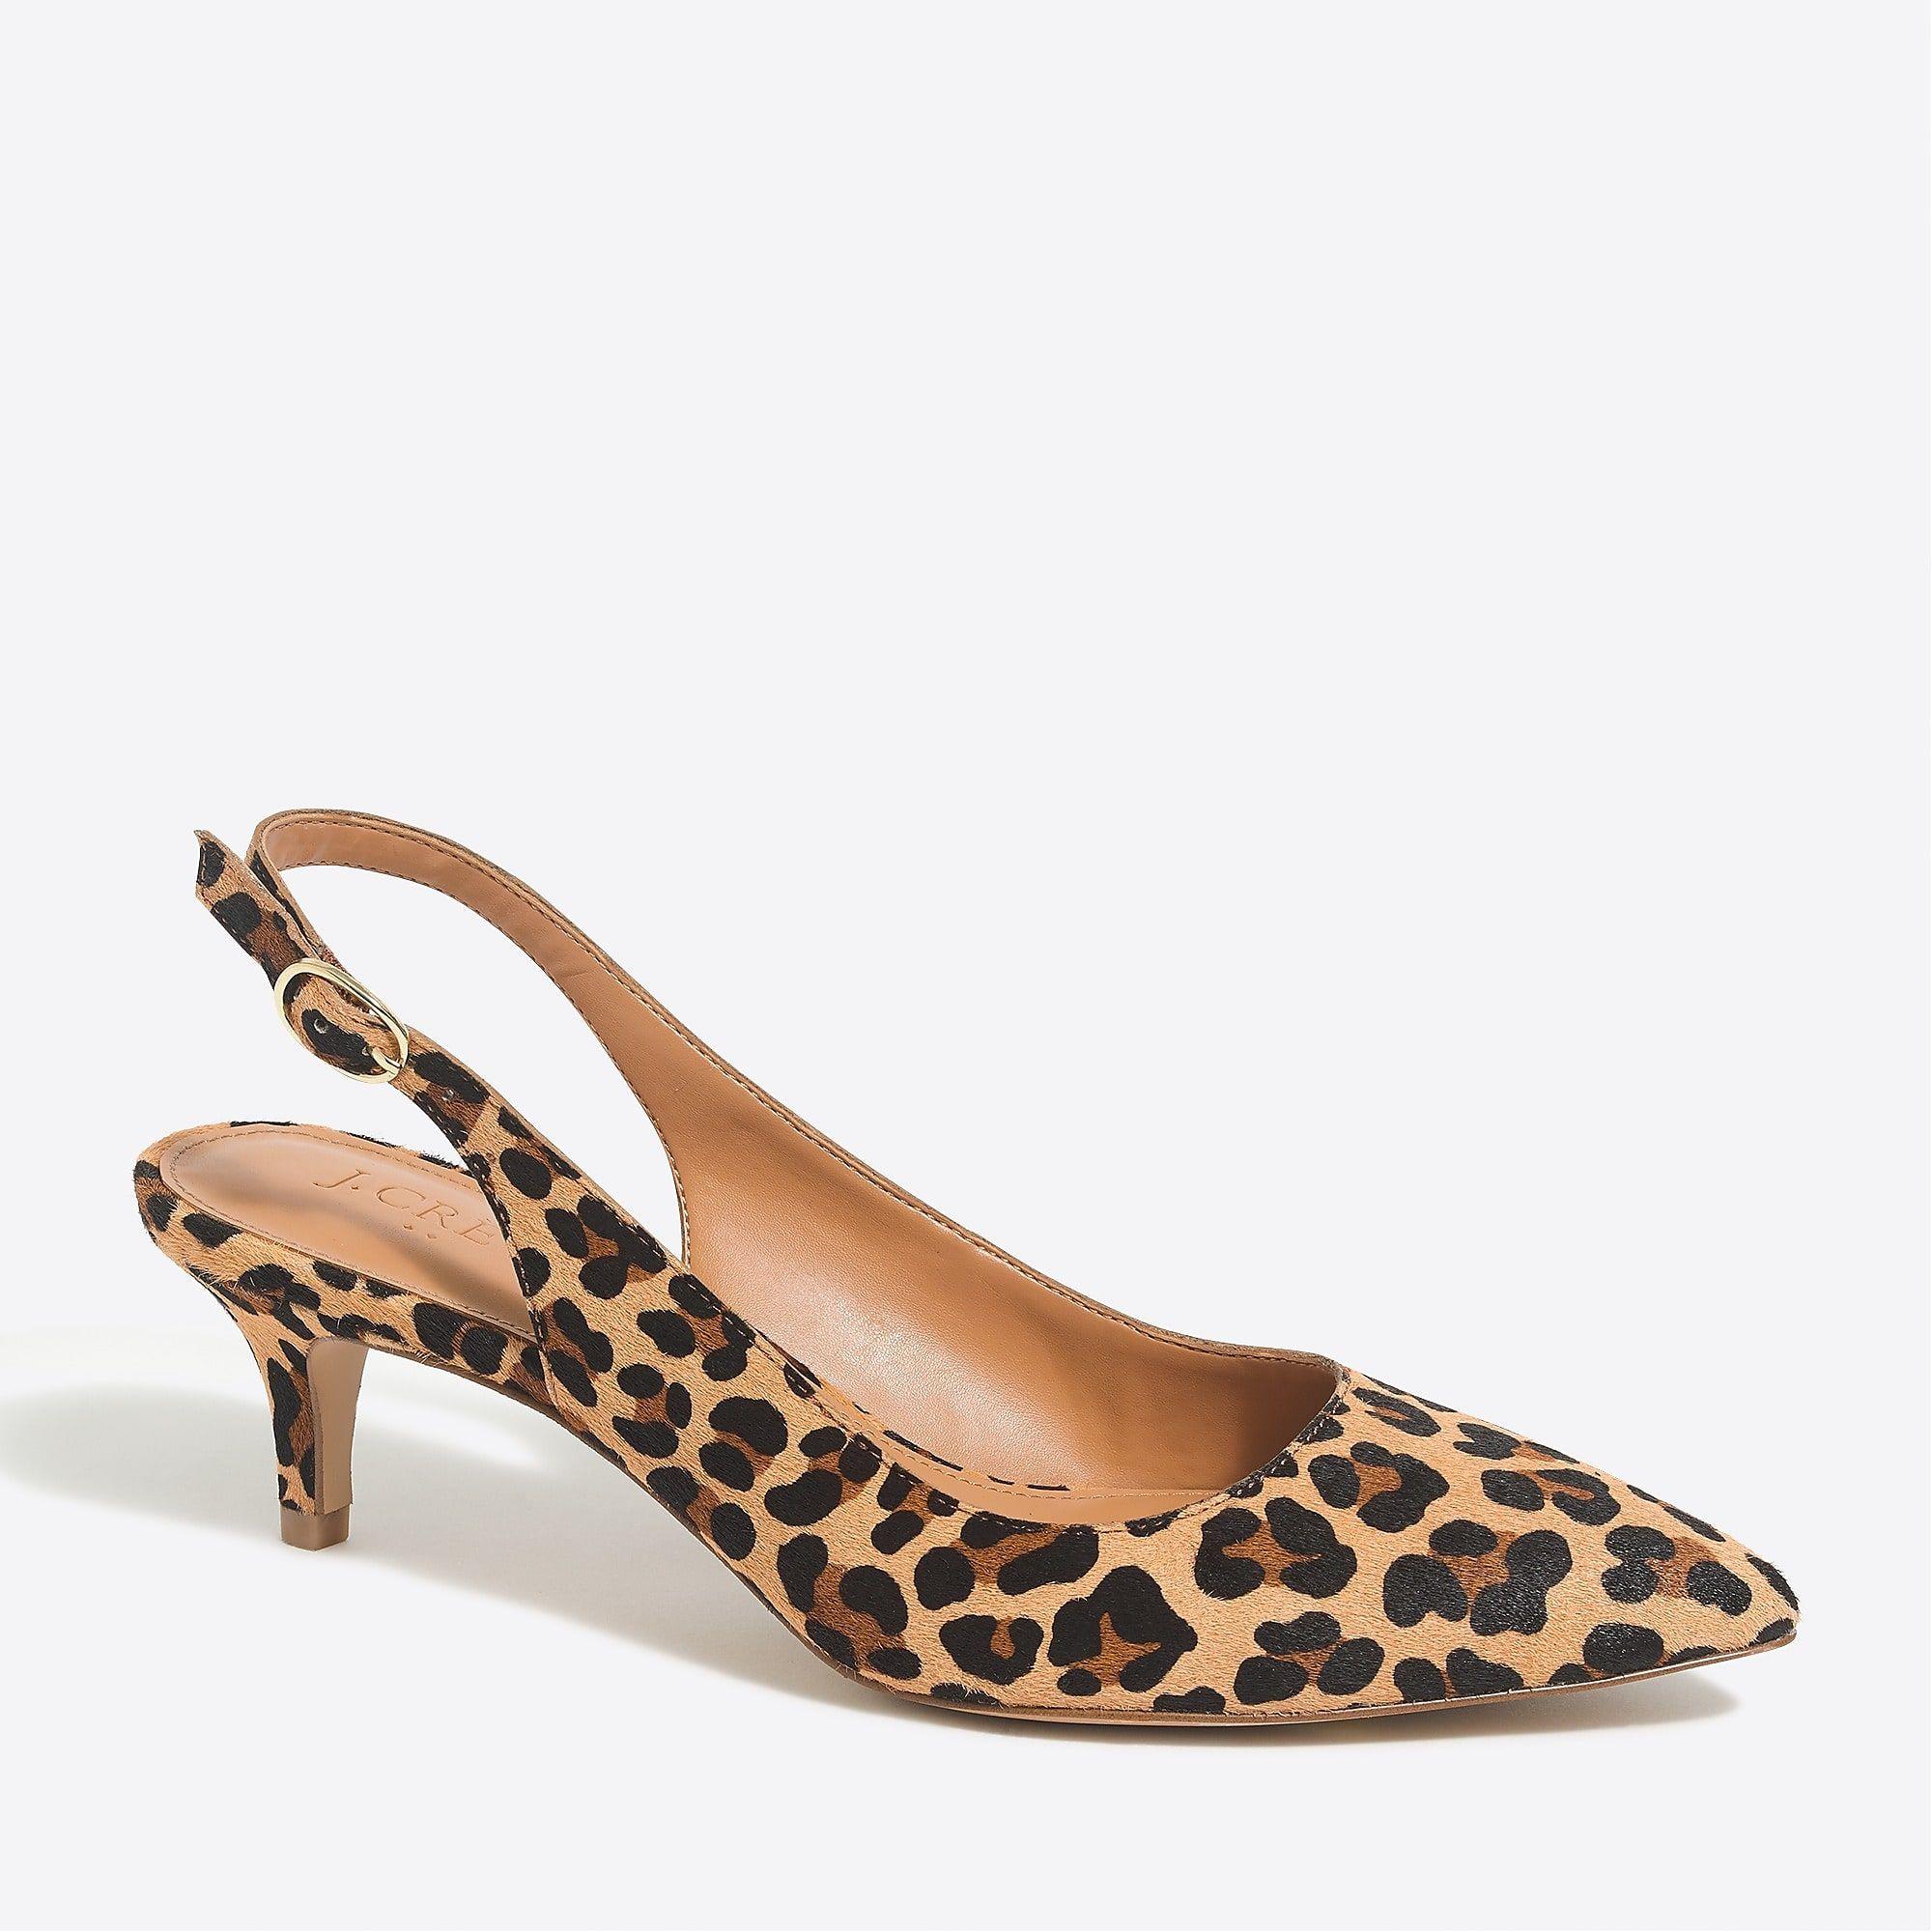 Esme Calf Hair Slingback Kitten Heels Kitten Heels Heels Kitten Heel Boots